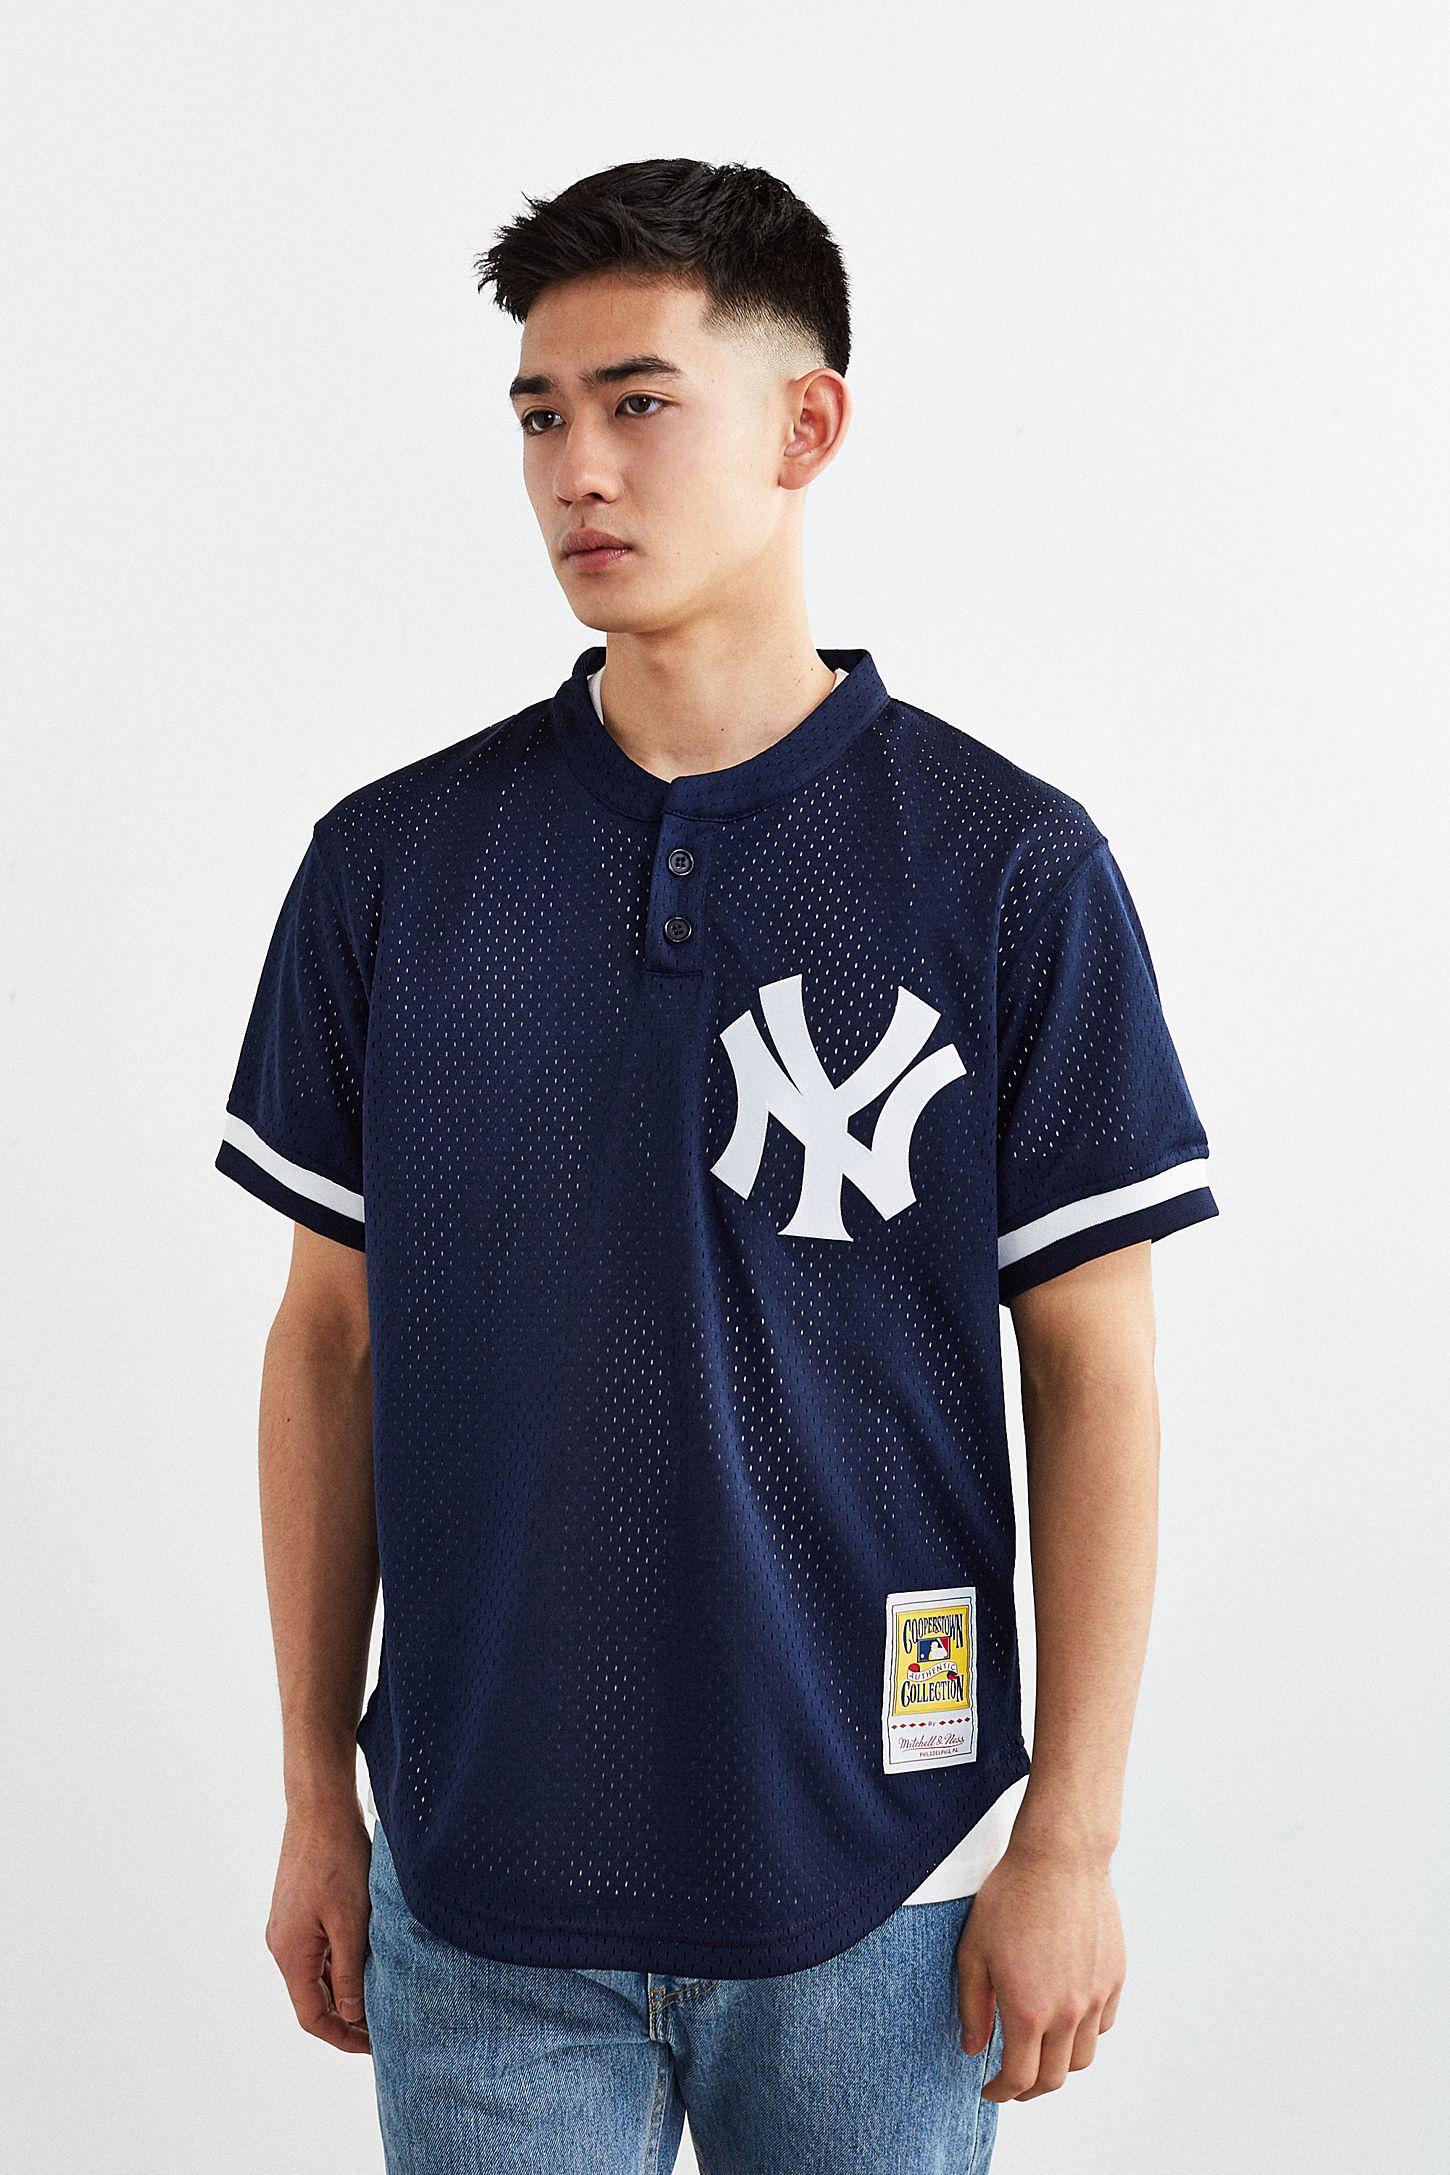 promo code c9ae8 47fb5 Mitchell & Ness Yankees Don Mattingly Baseball Jersey